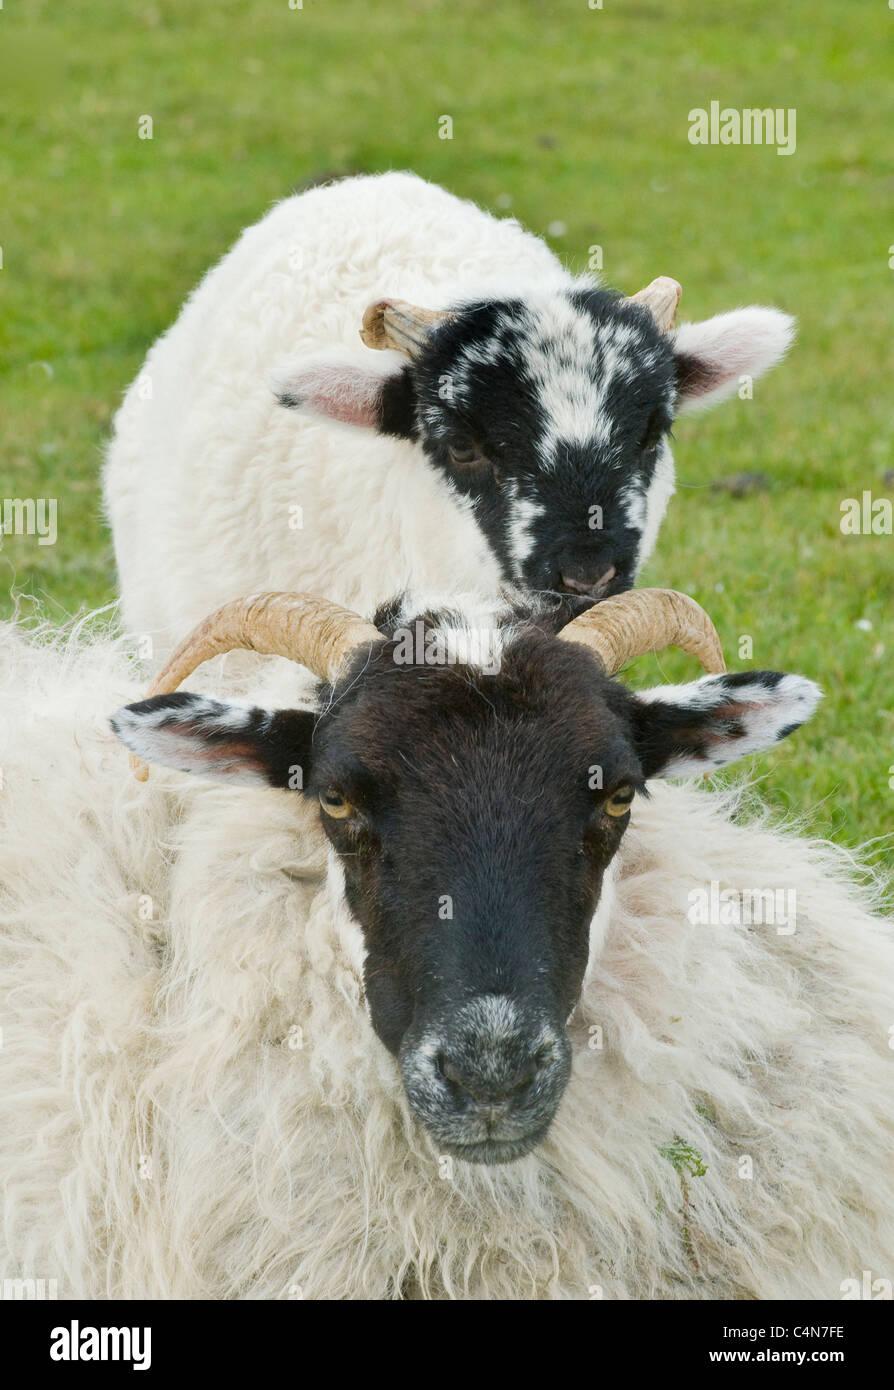 Black-faced Sheep and lamb, Western Ireland - Stock Image